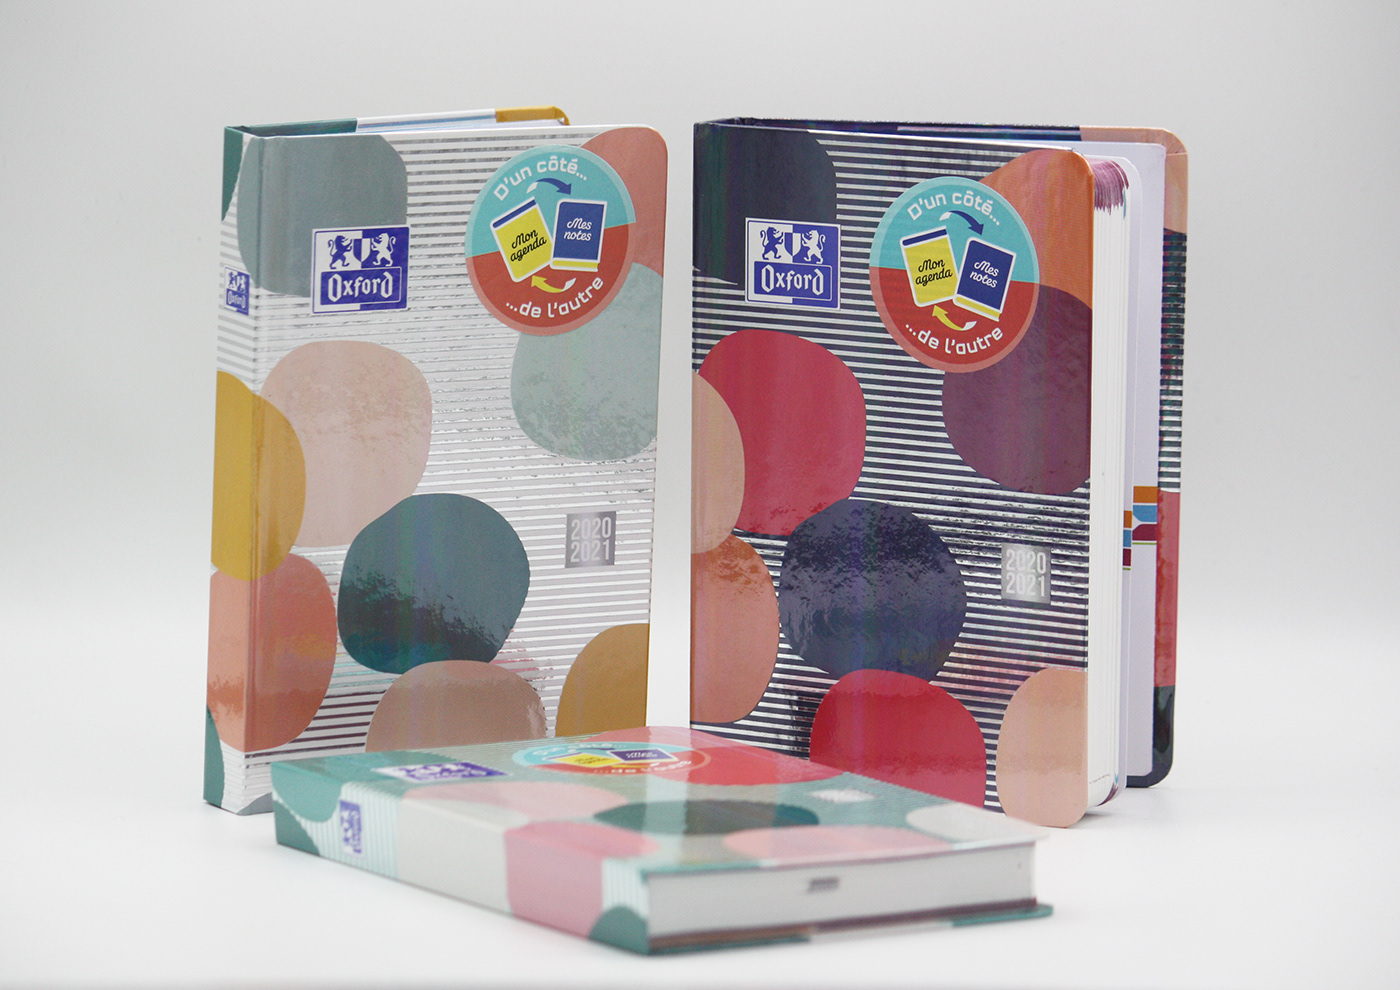 agenda agendas Fashion  graphic design  graphiste freelance identité visuelle nansush oxford print scolaire